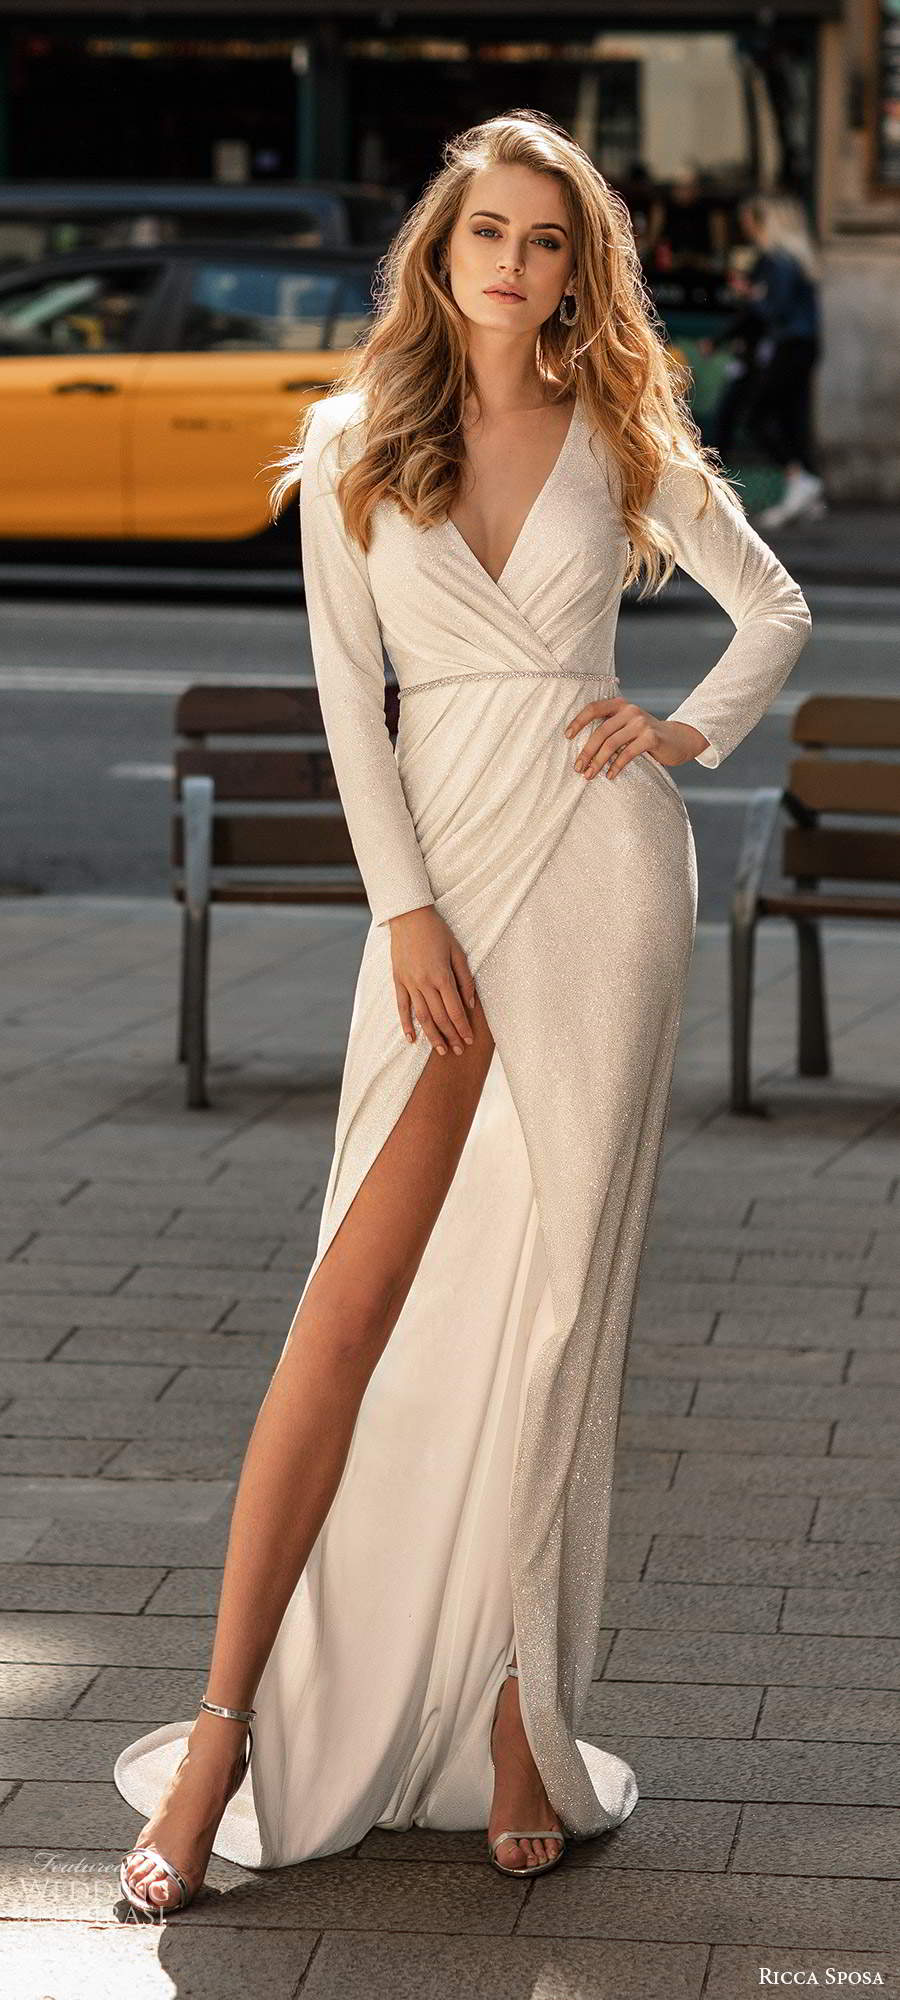 ricca sposa 2020 barcelona bridal long sleeves surplice v neckline ruched wrap bodice sheath wedding dress slit skirt sweep train (24)